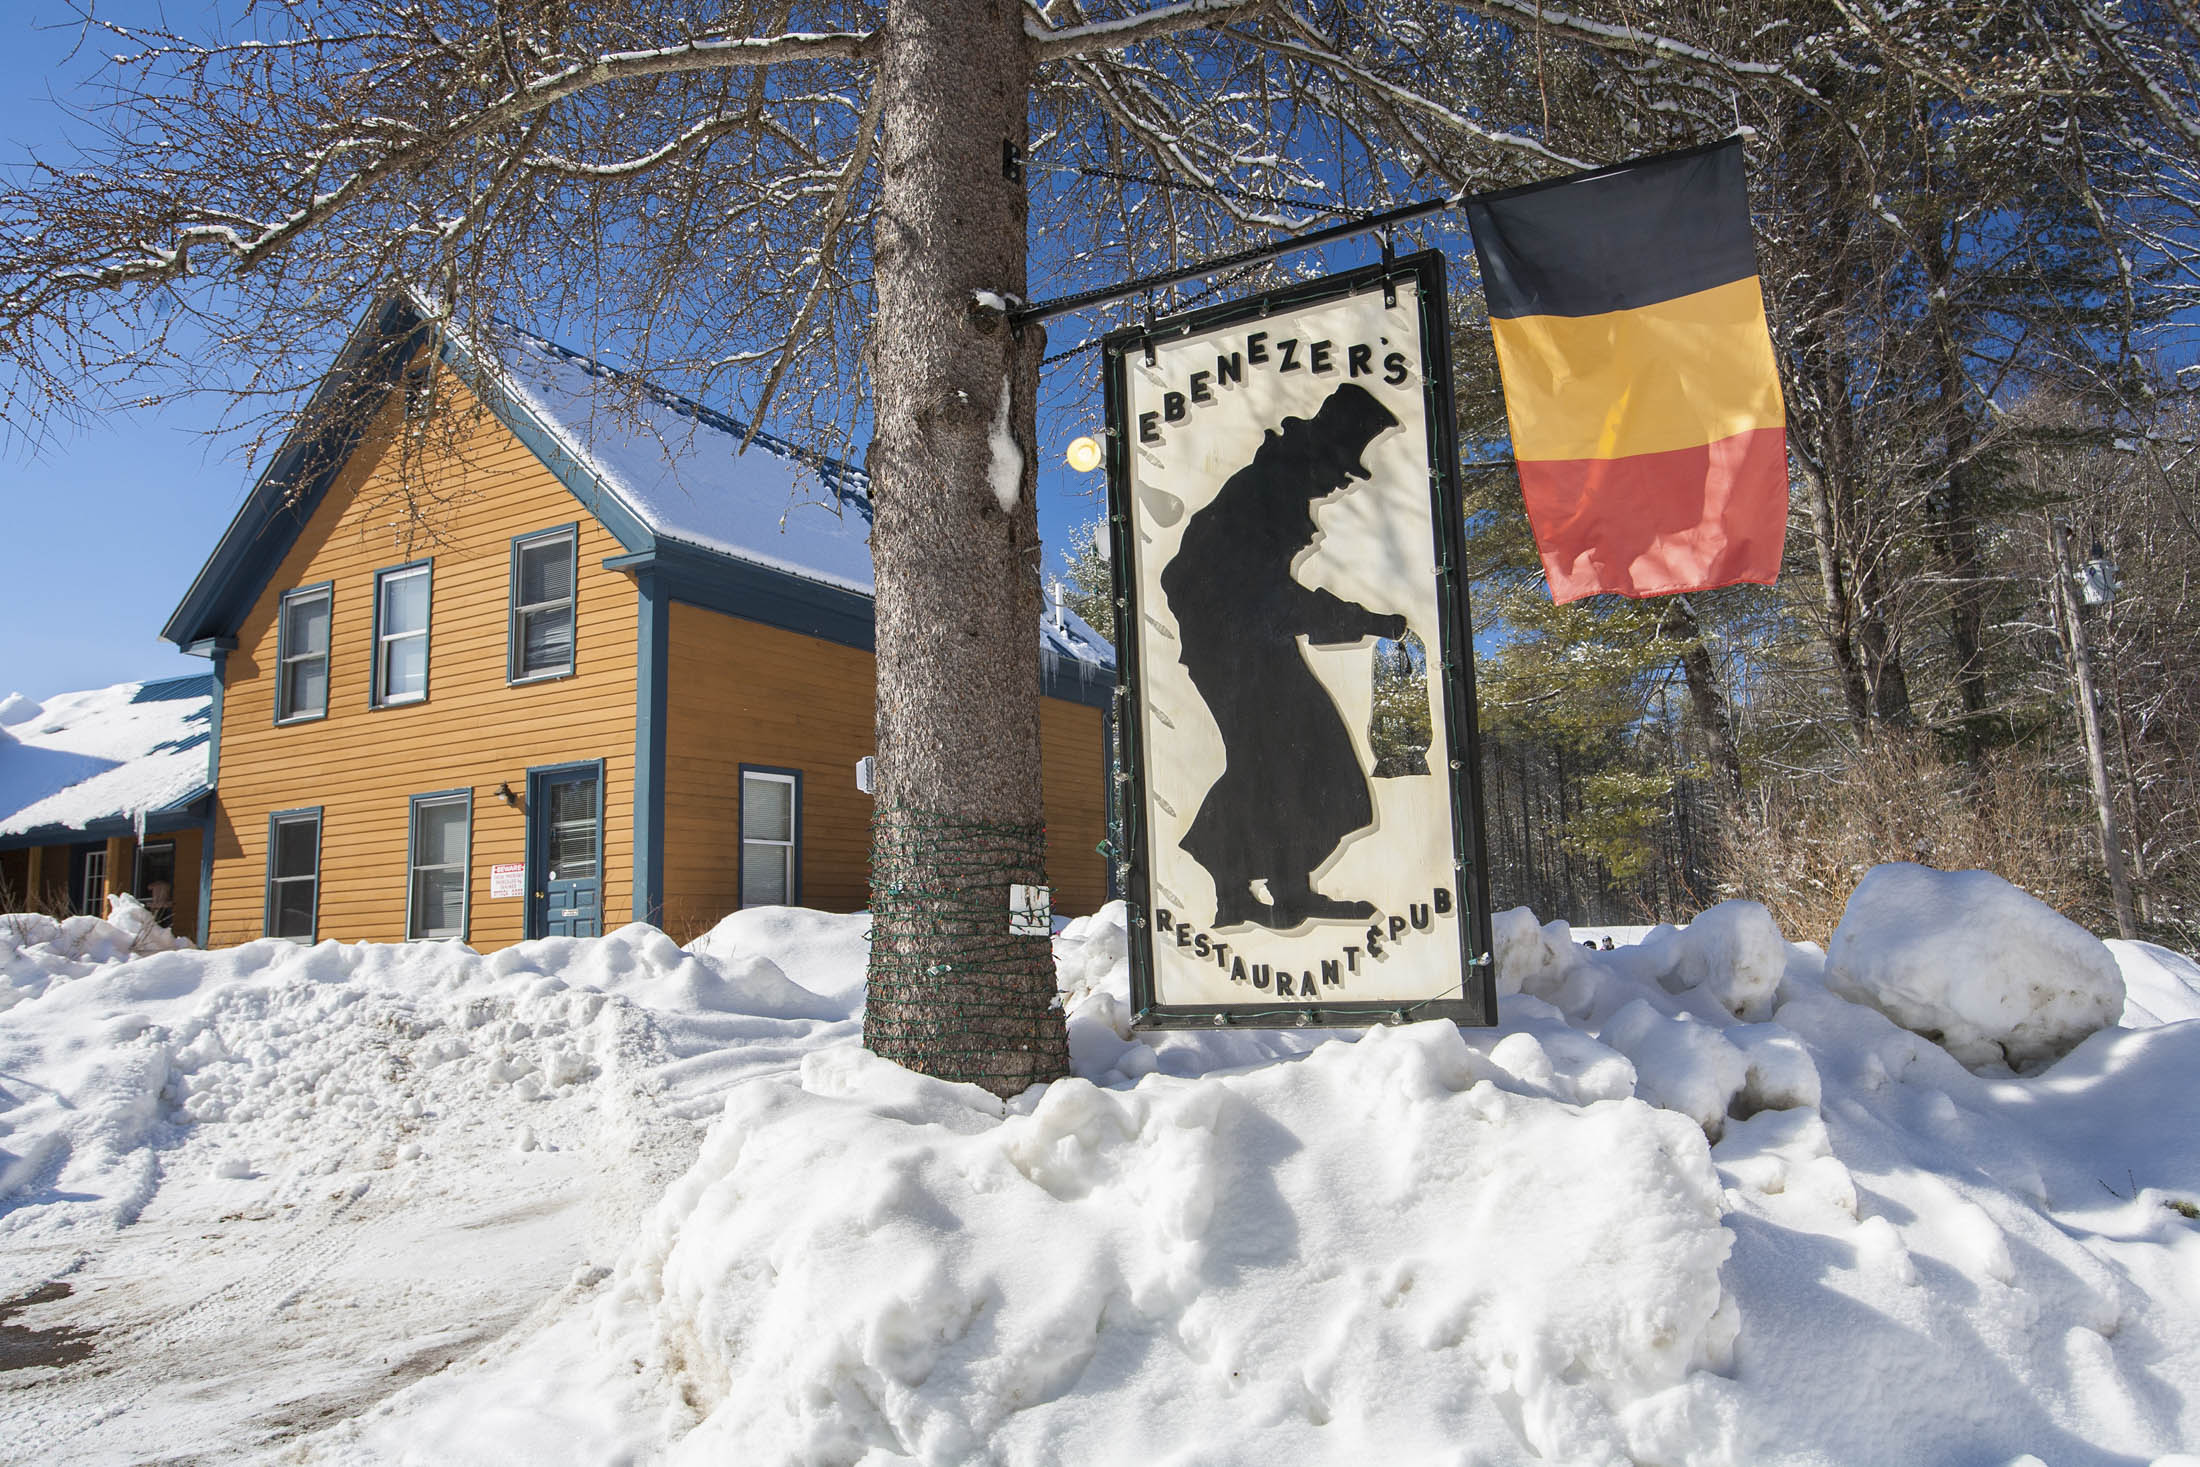 Ebenezer's Pub